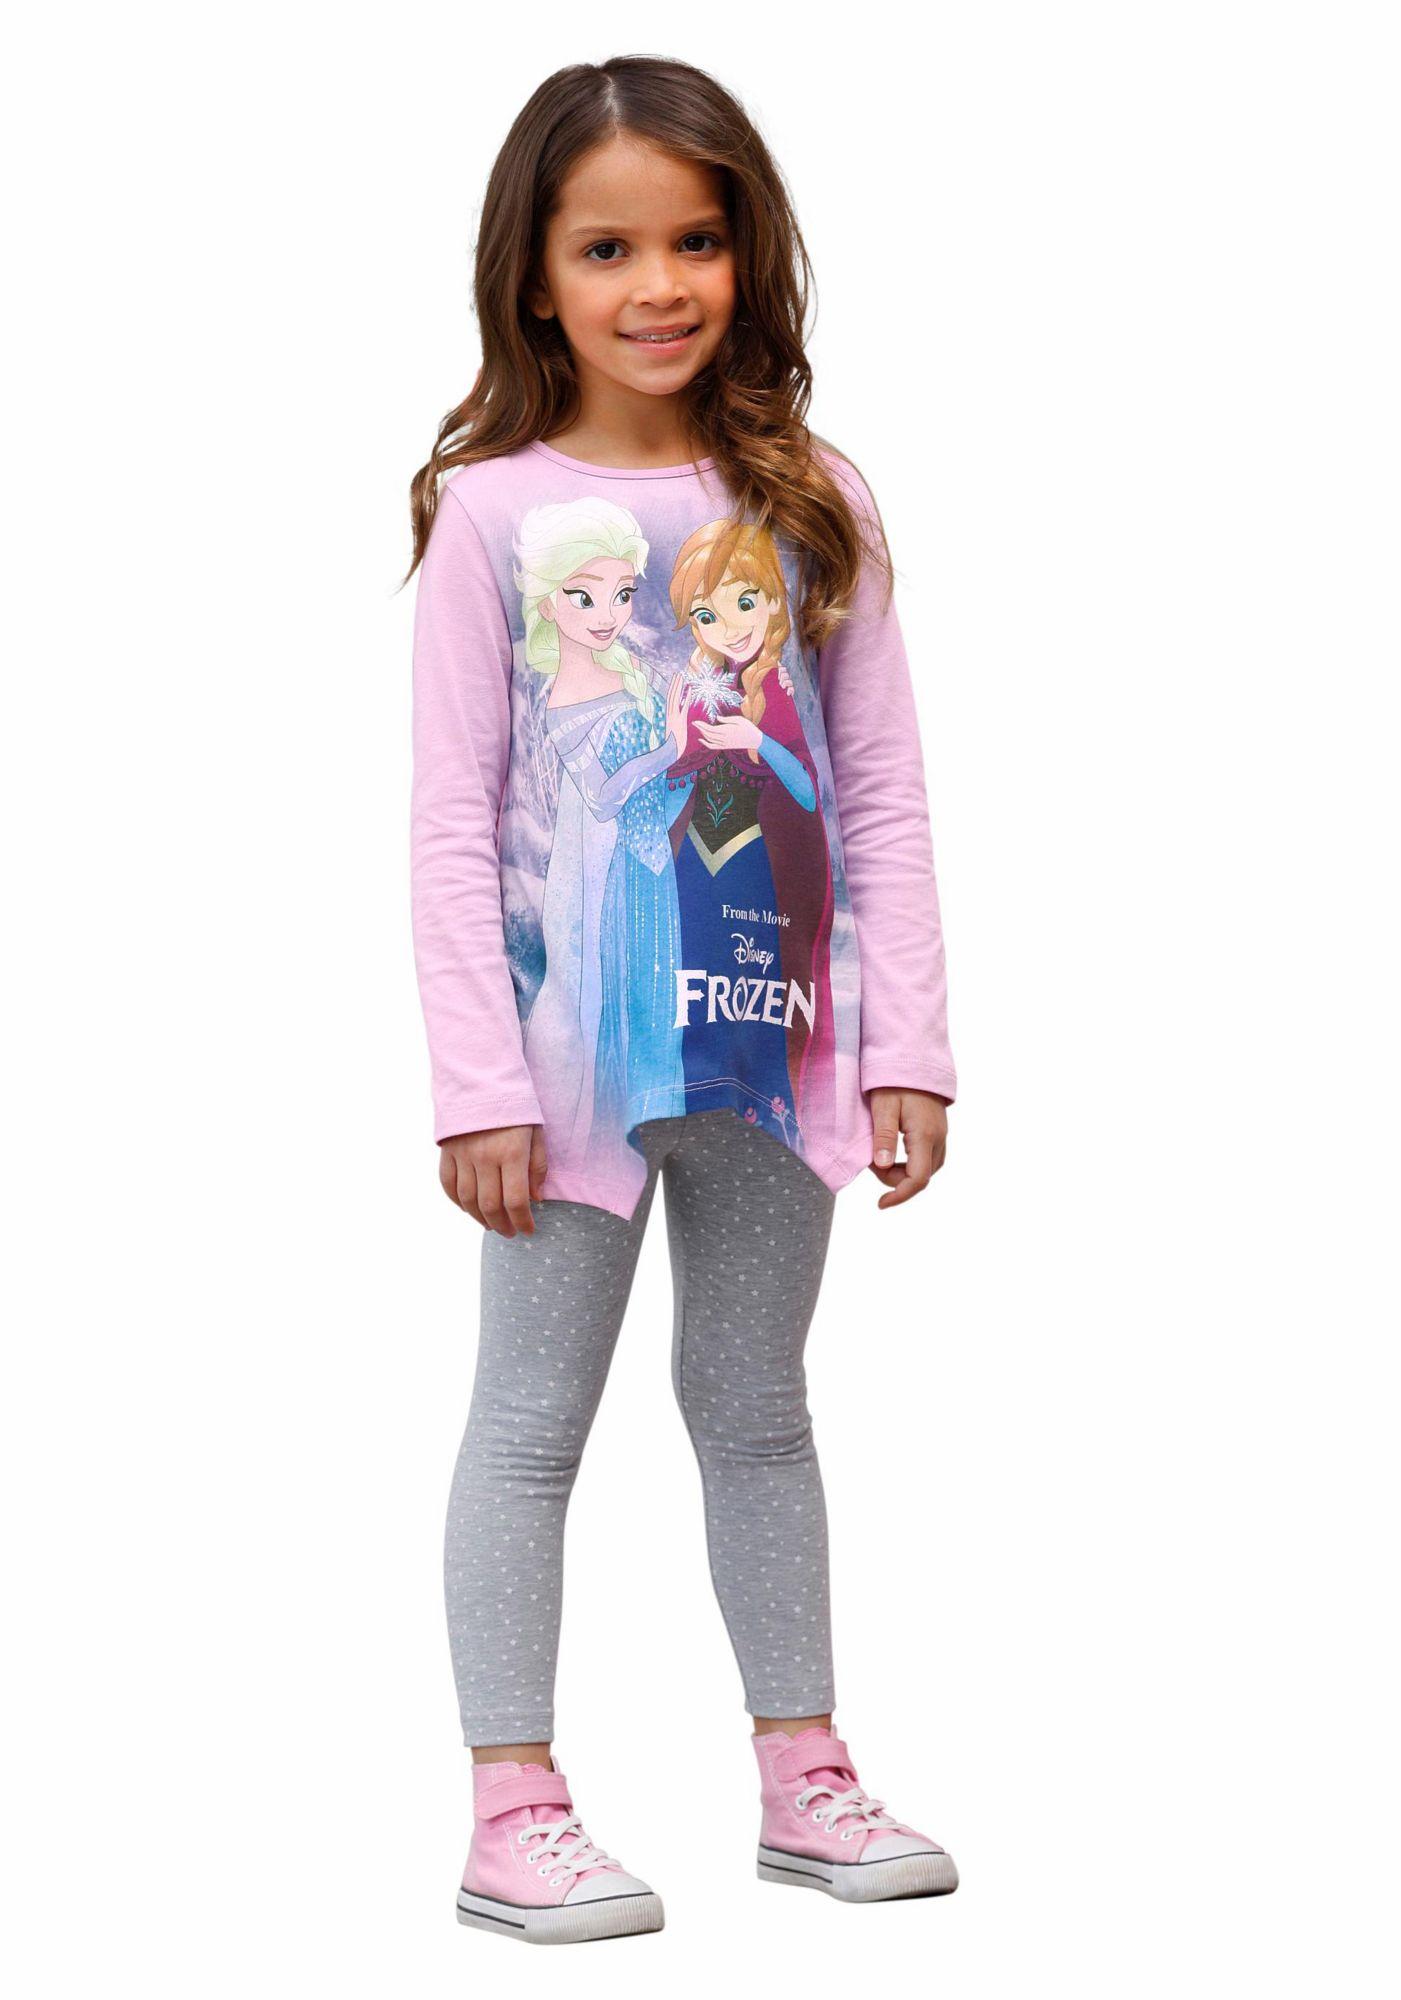 DISNEY FROZEN Disney Frozen Langarmshirt & Leggings (Set, 2 tlg.)